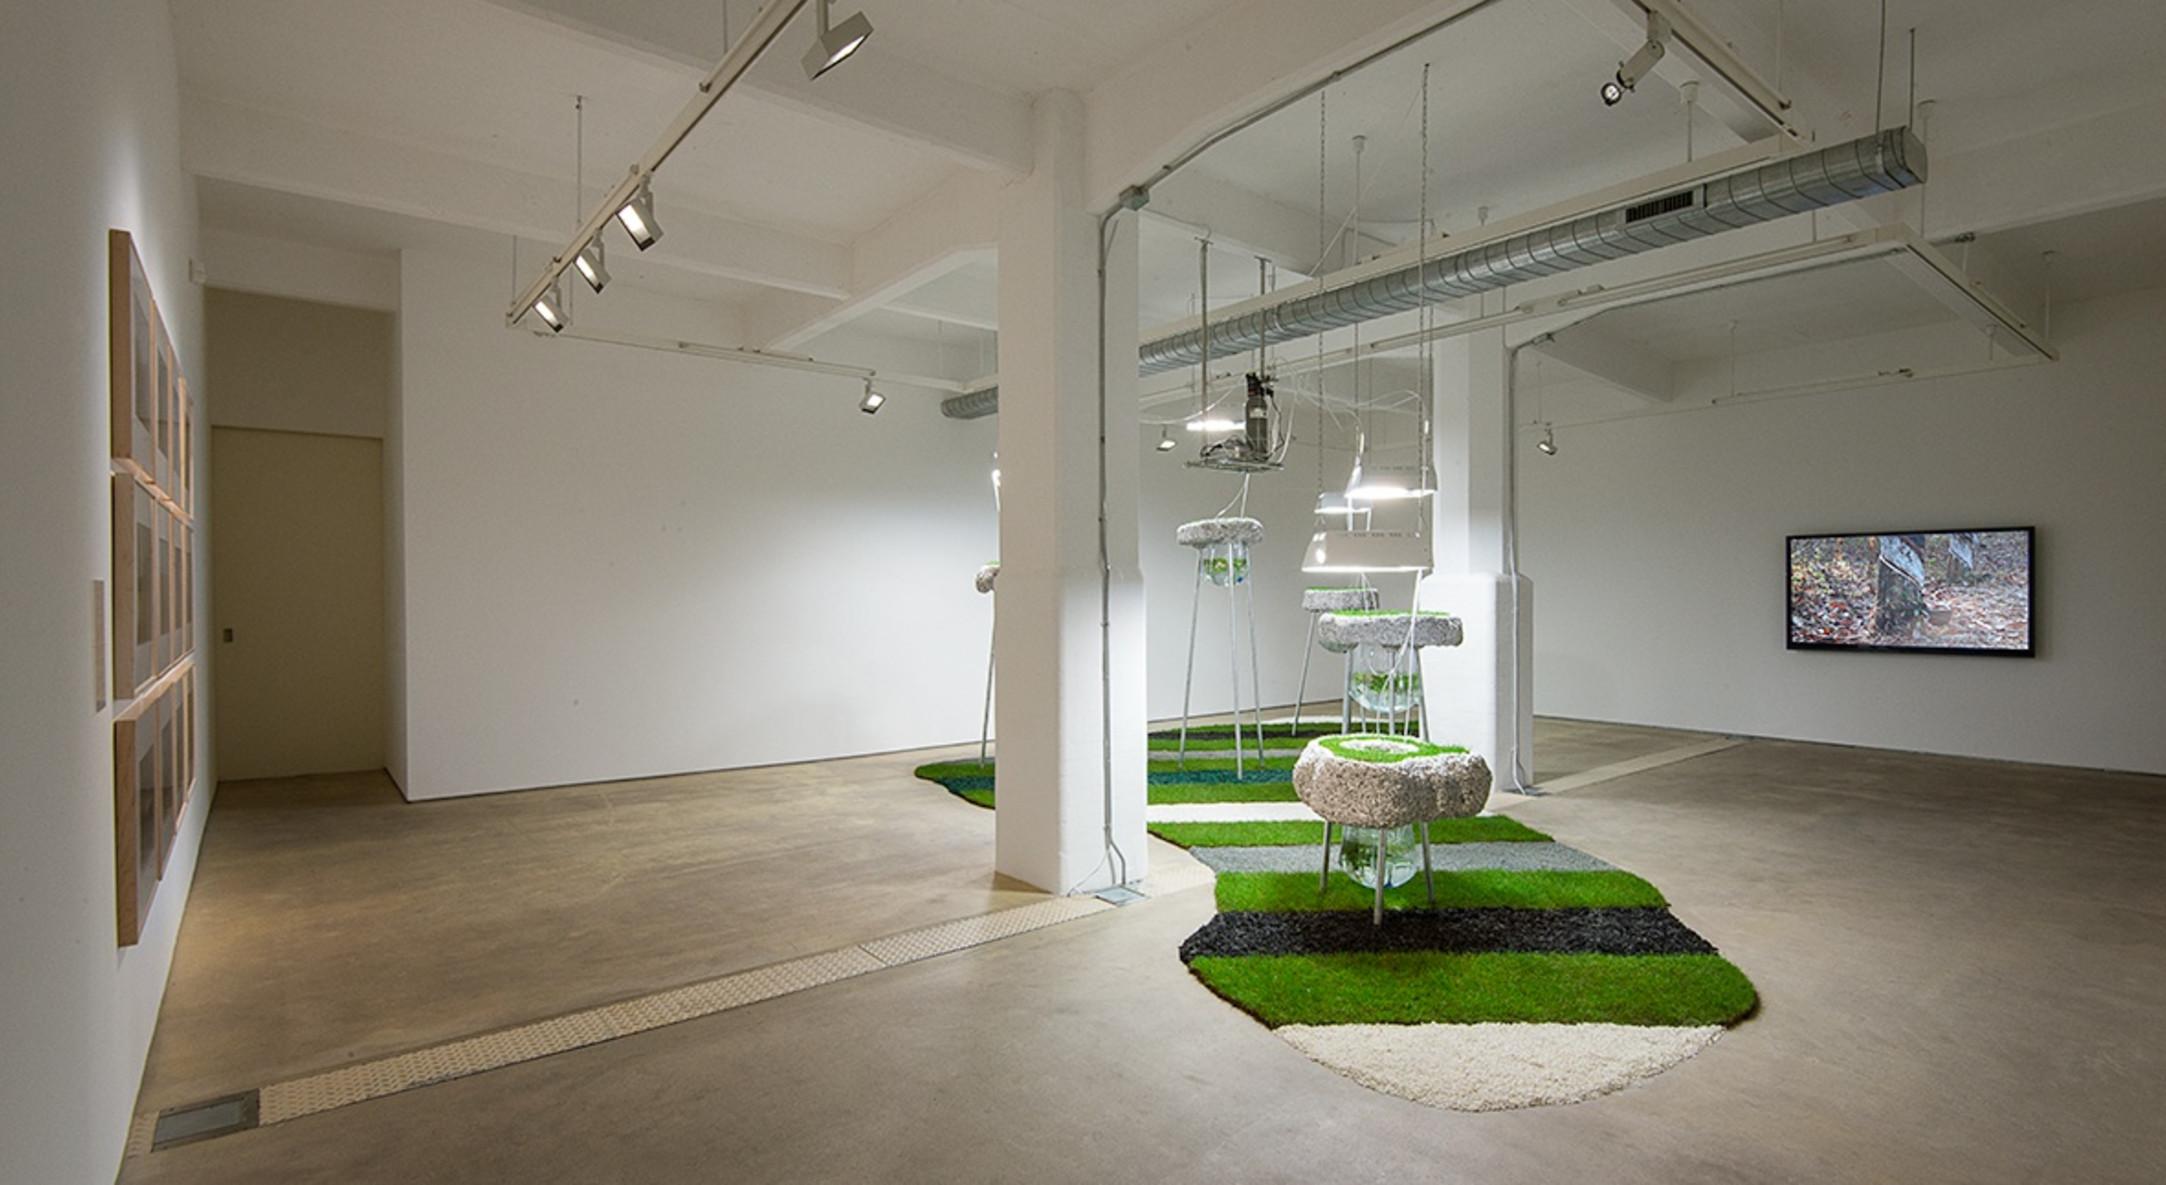 Installation view of Rachael Champion, Agnes Denes, and Rachel Pimm at Hales London